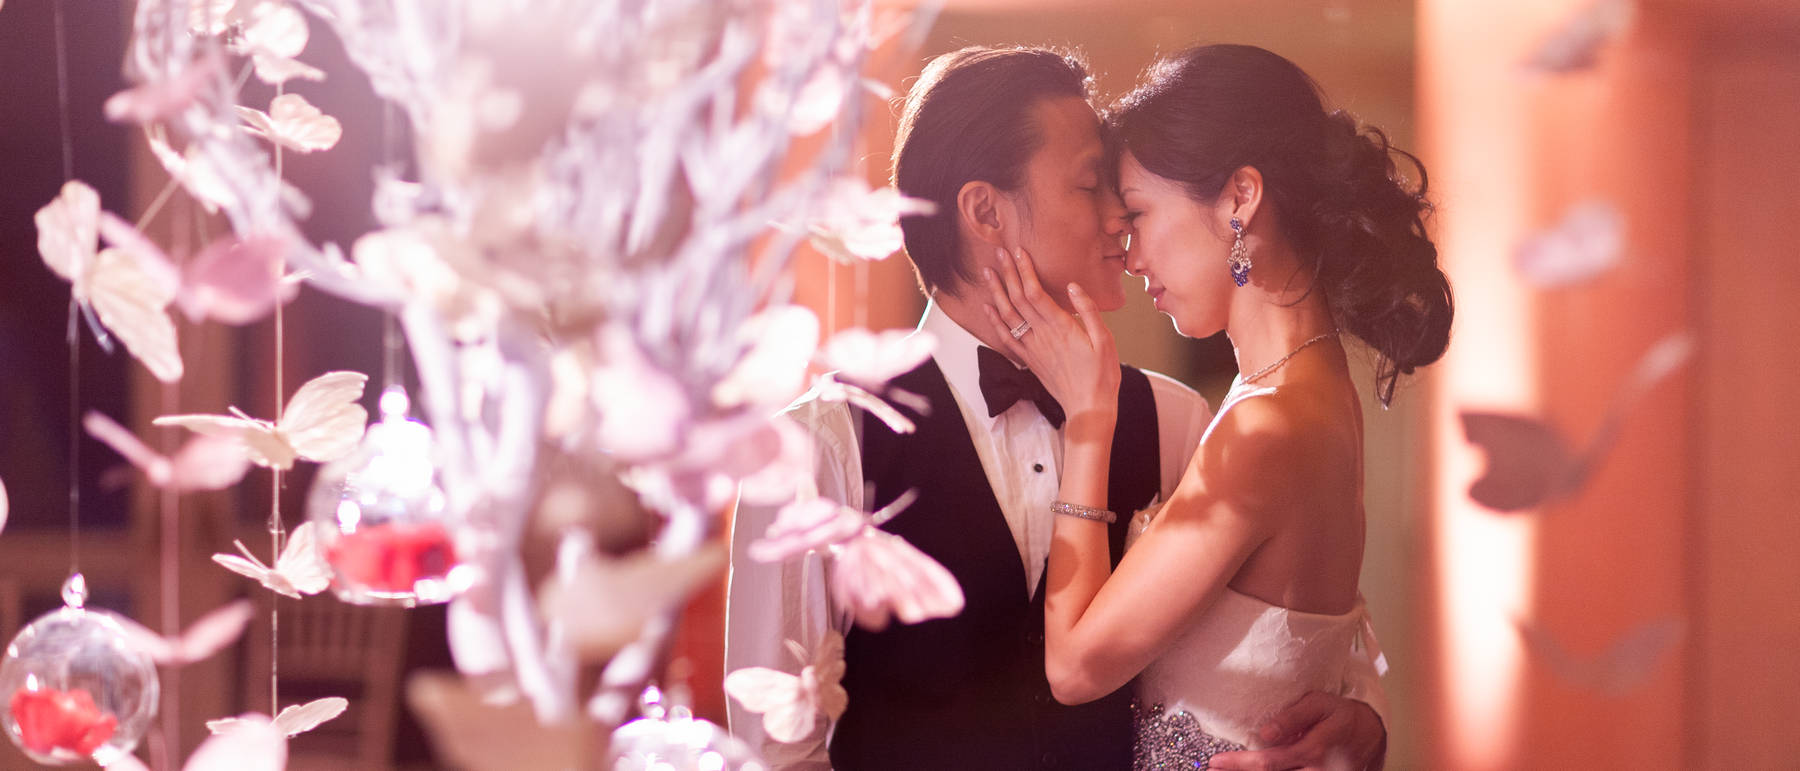 johnandjoseph-wedding-photographer-hz-slider-331